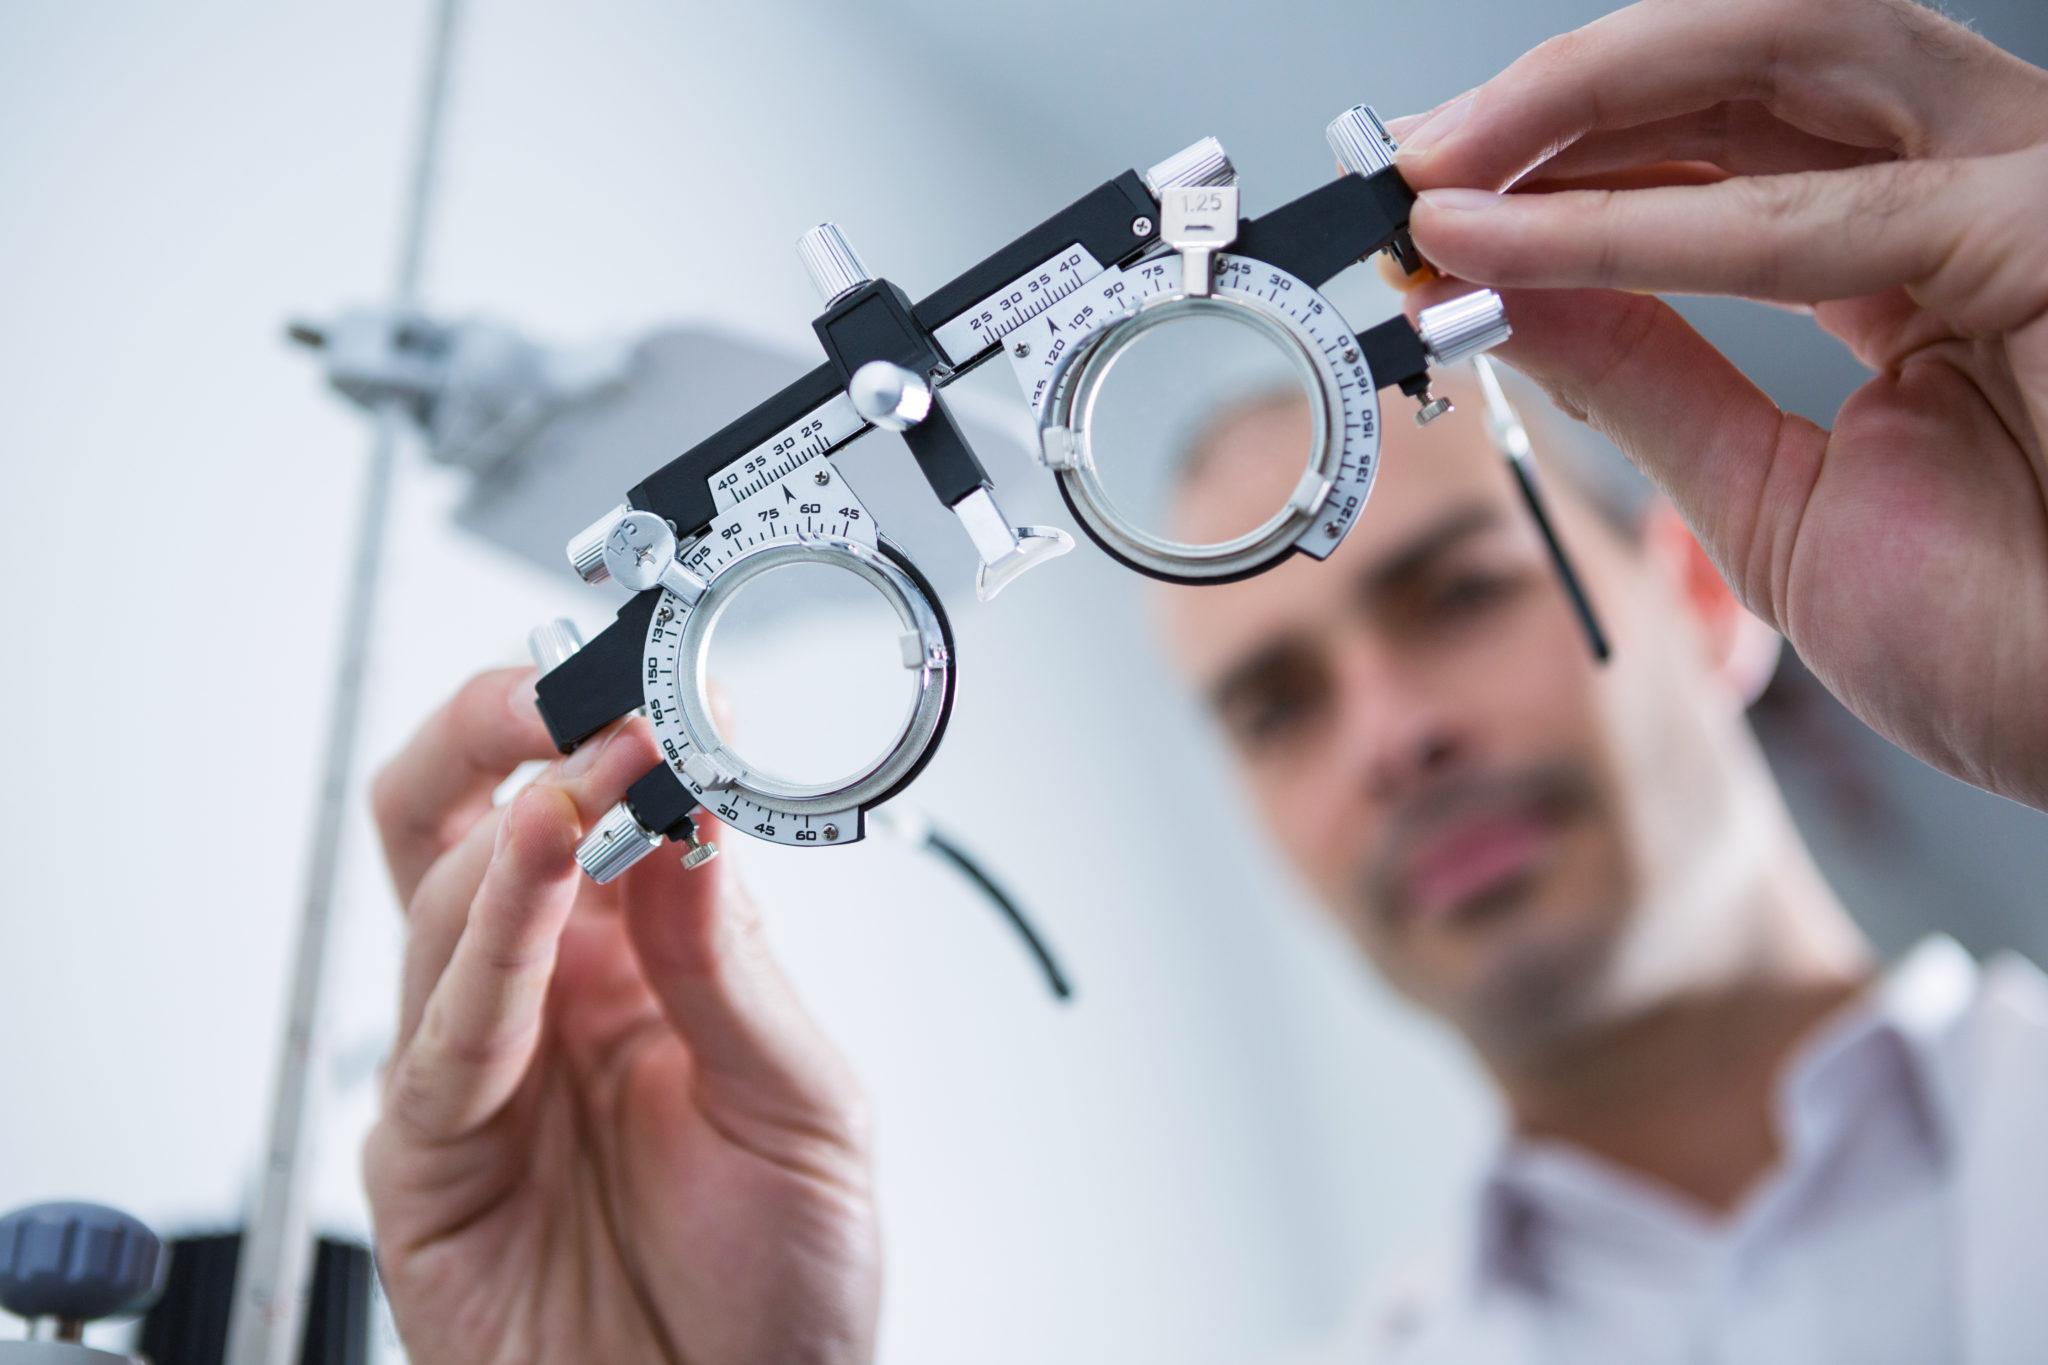 okulary do badania wzroku